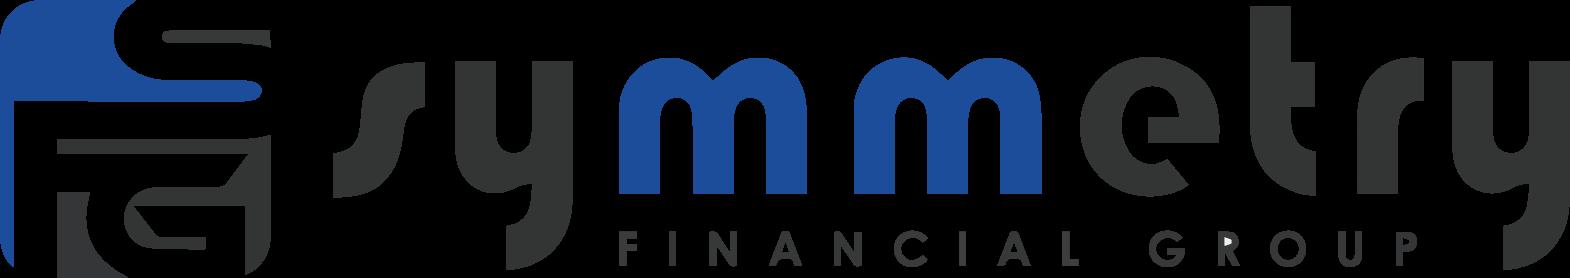 Symmetry Financial Group